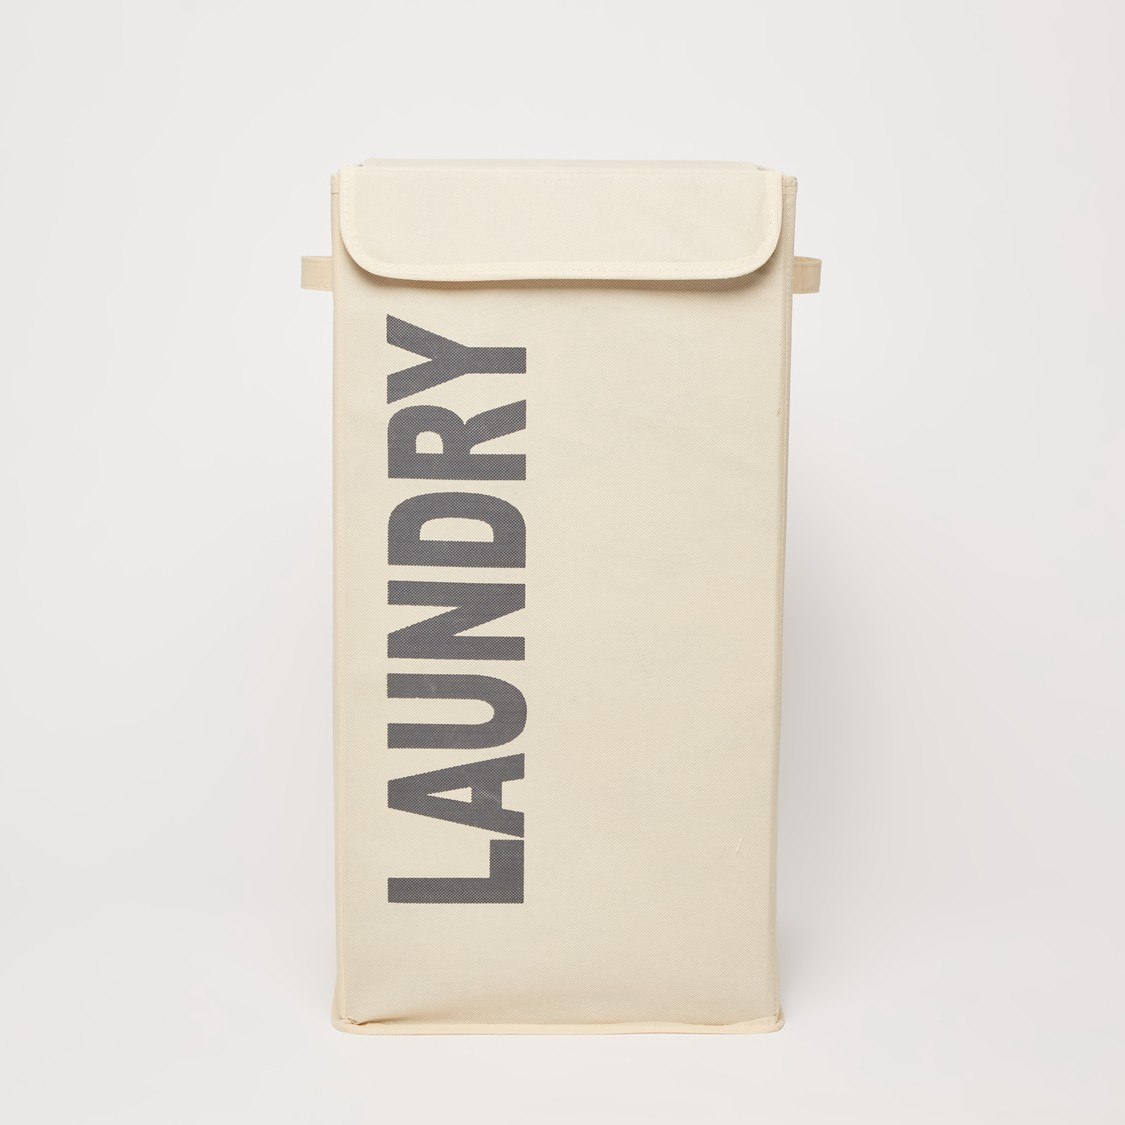 Printed Laundry Basket - 30x60 cms